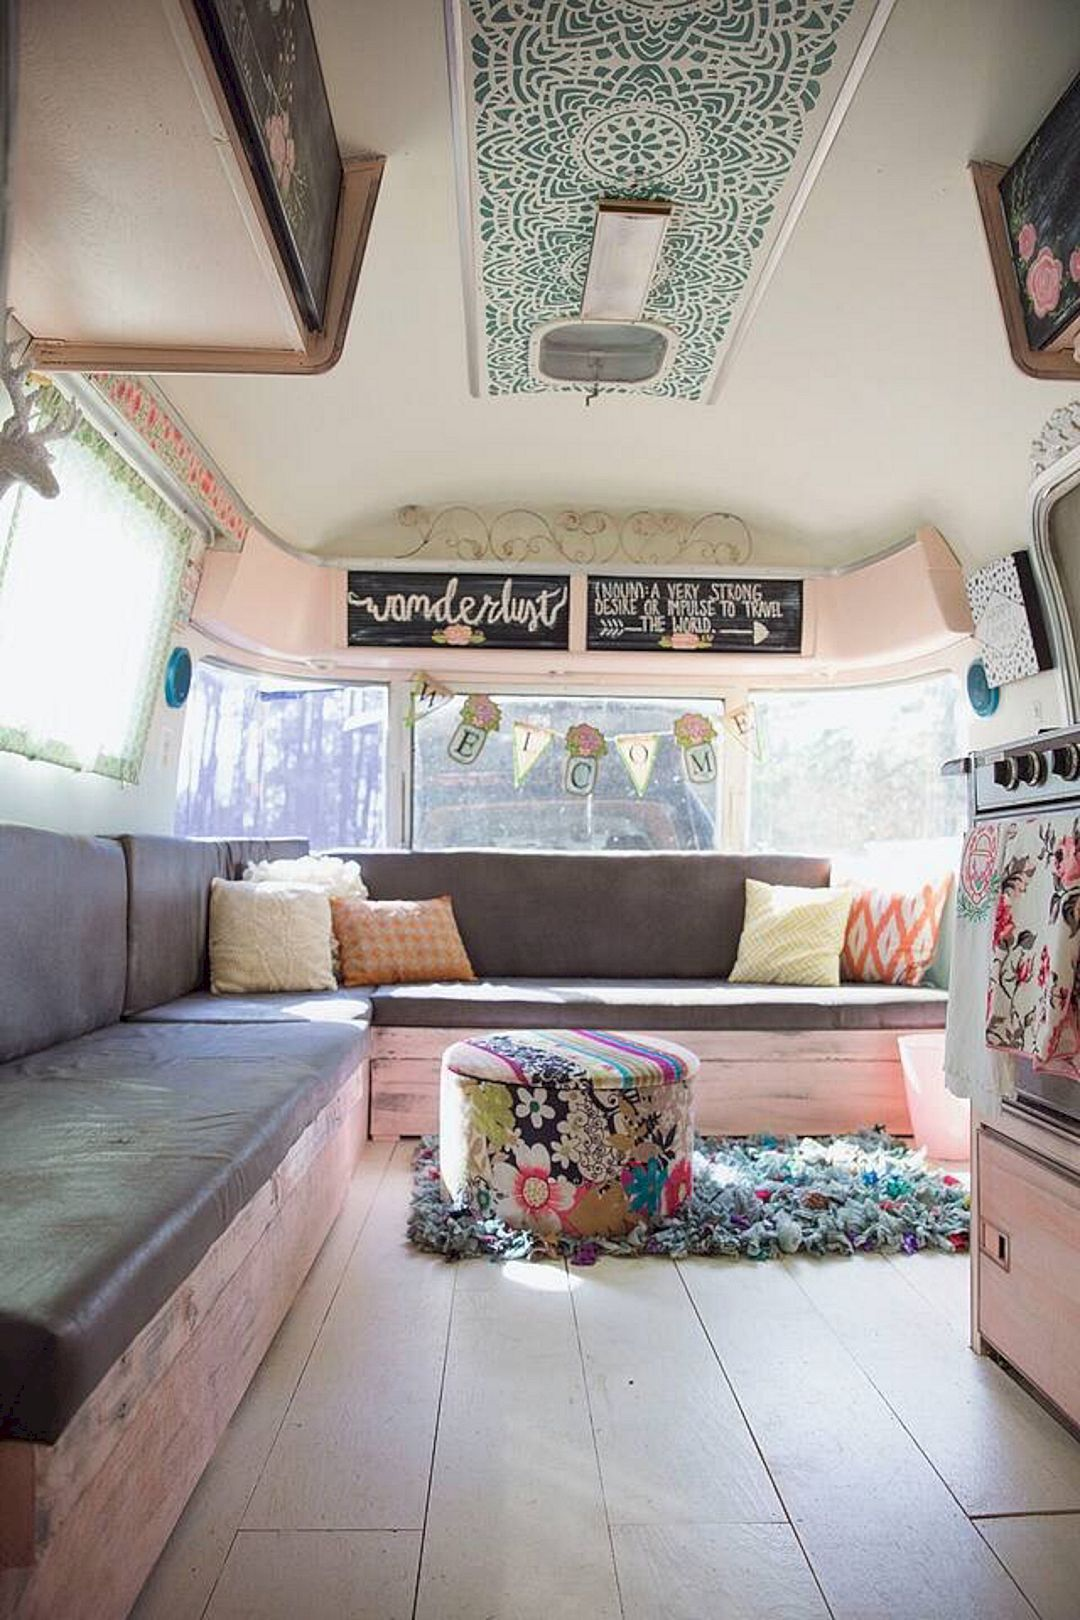 pin camper ideas van rv decorating best interior adorable s